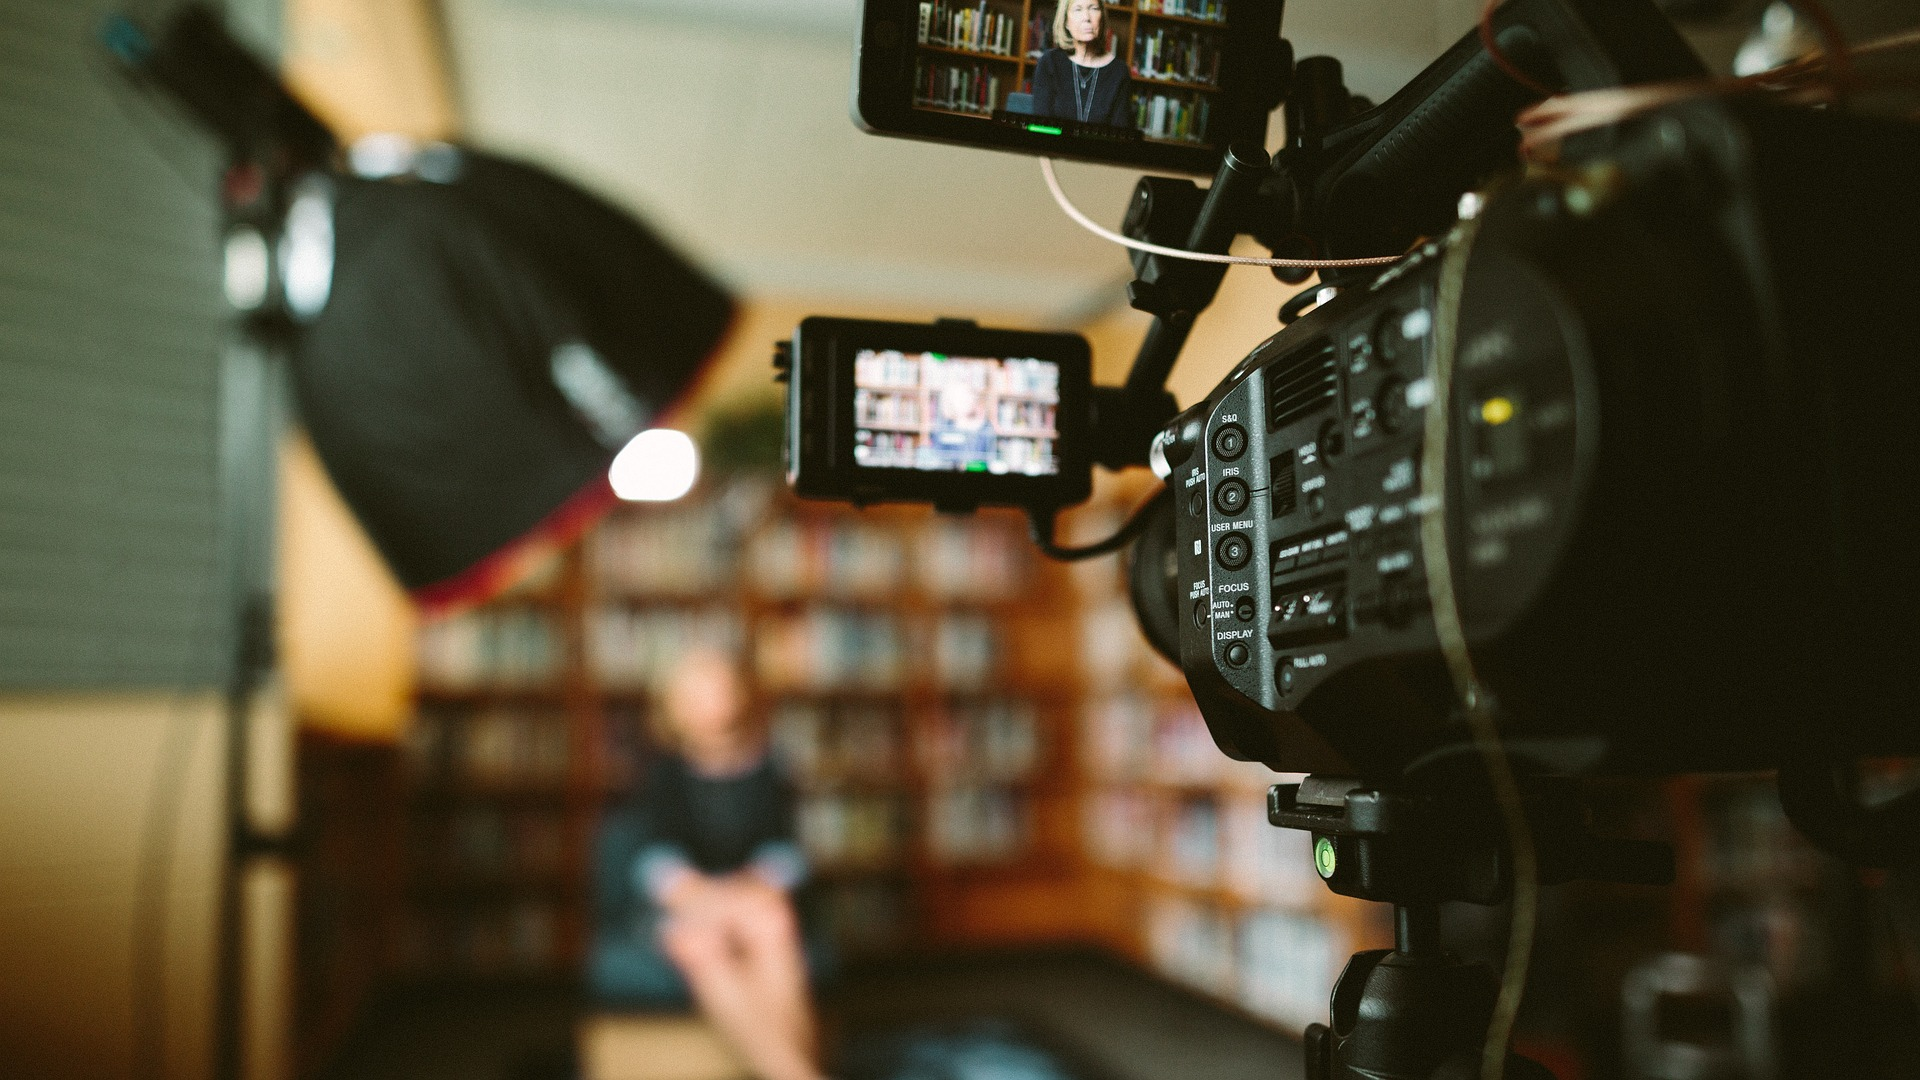 video 2562034 1920 - 初心者向け!WordPressの投稿方法や記事の編集方法を徹底解説